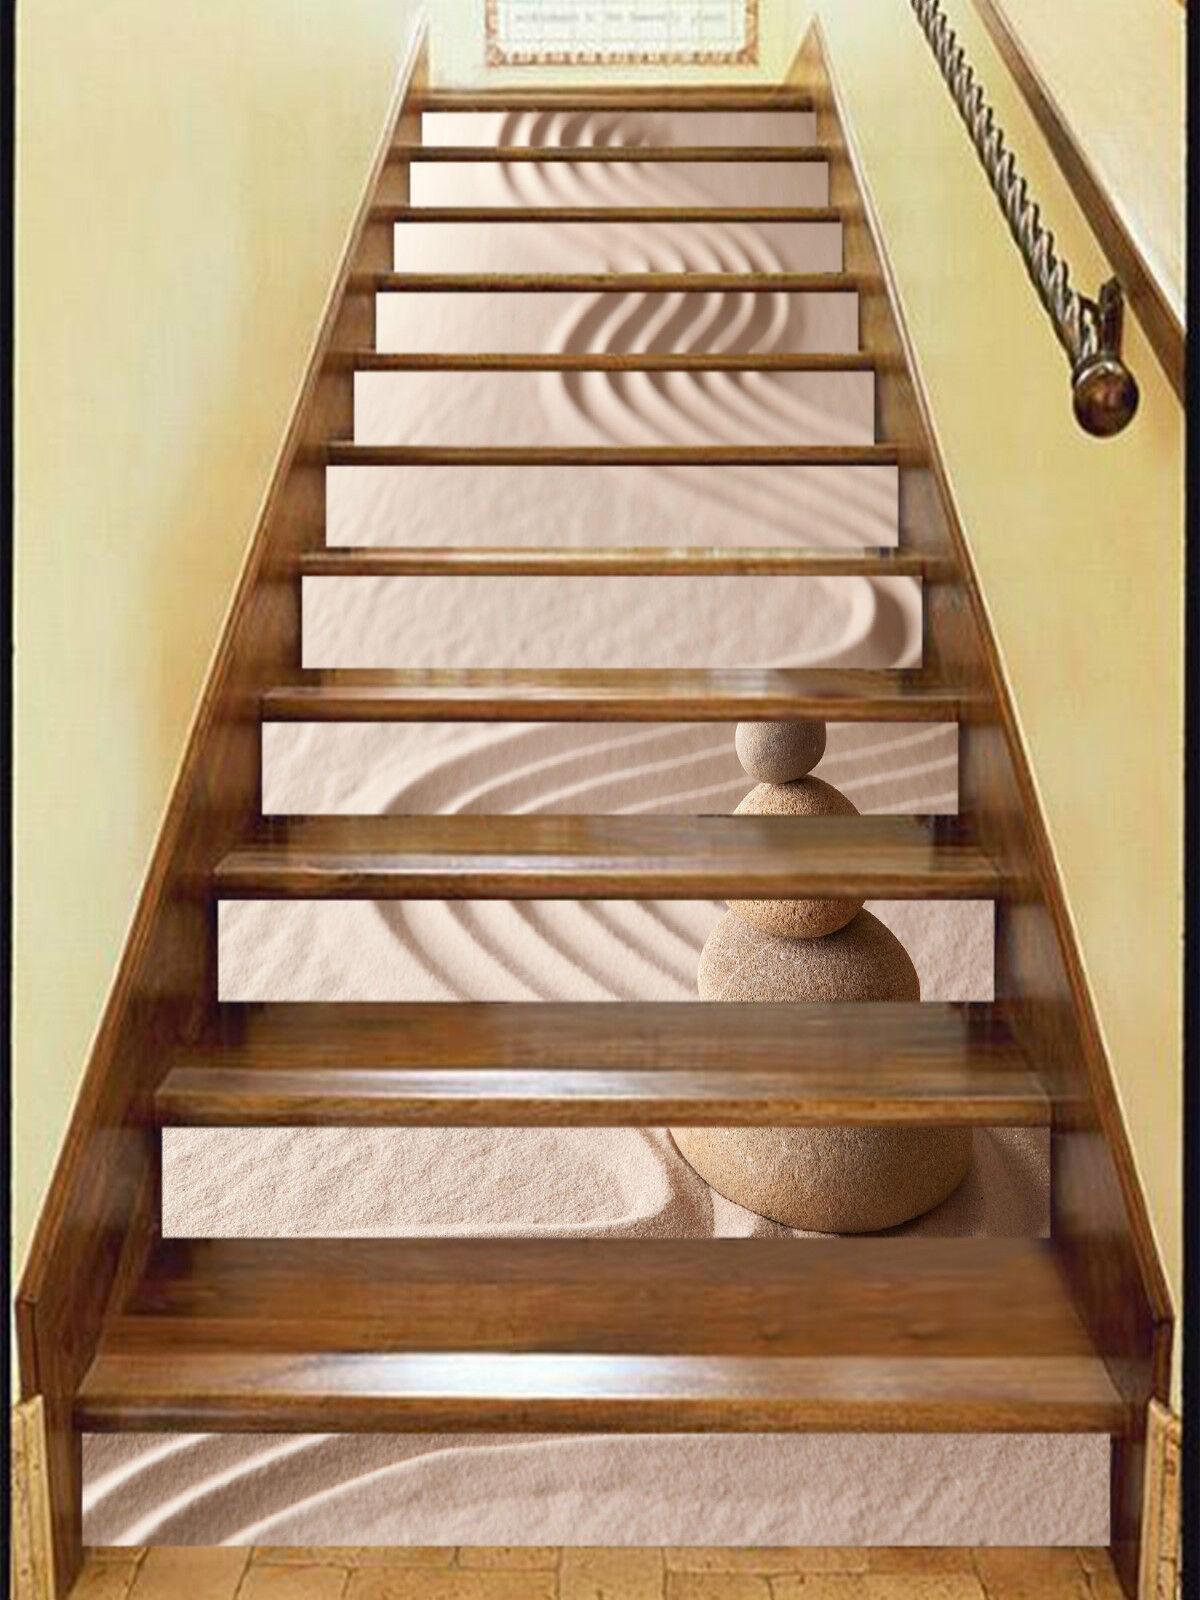 3D Sand Stein 536 Stair Risers Dekoration Fototapete Vinyl Aufkleber Tapete DE